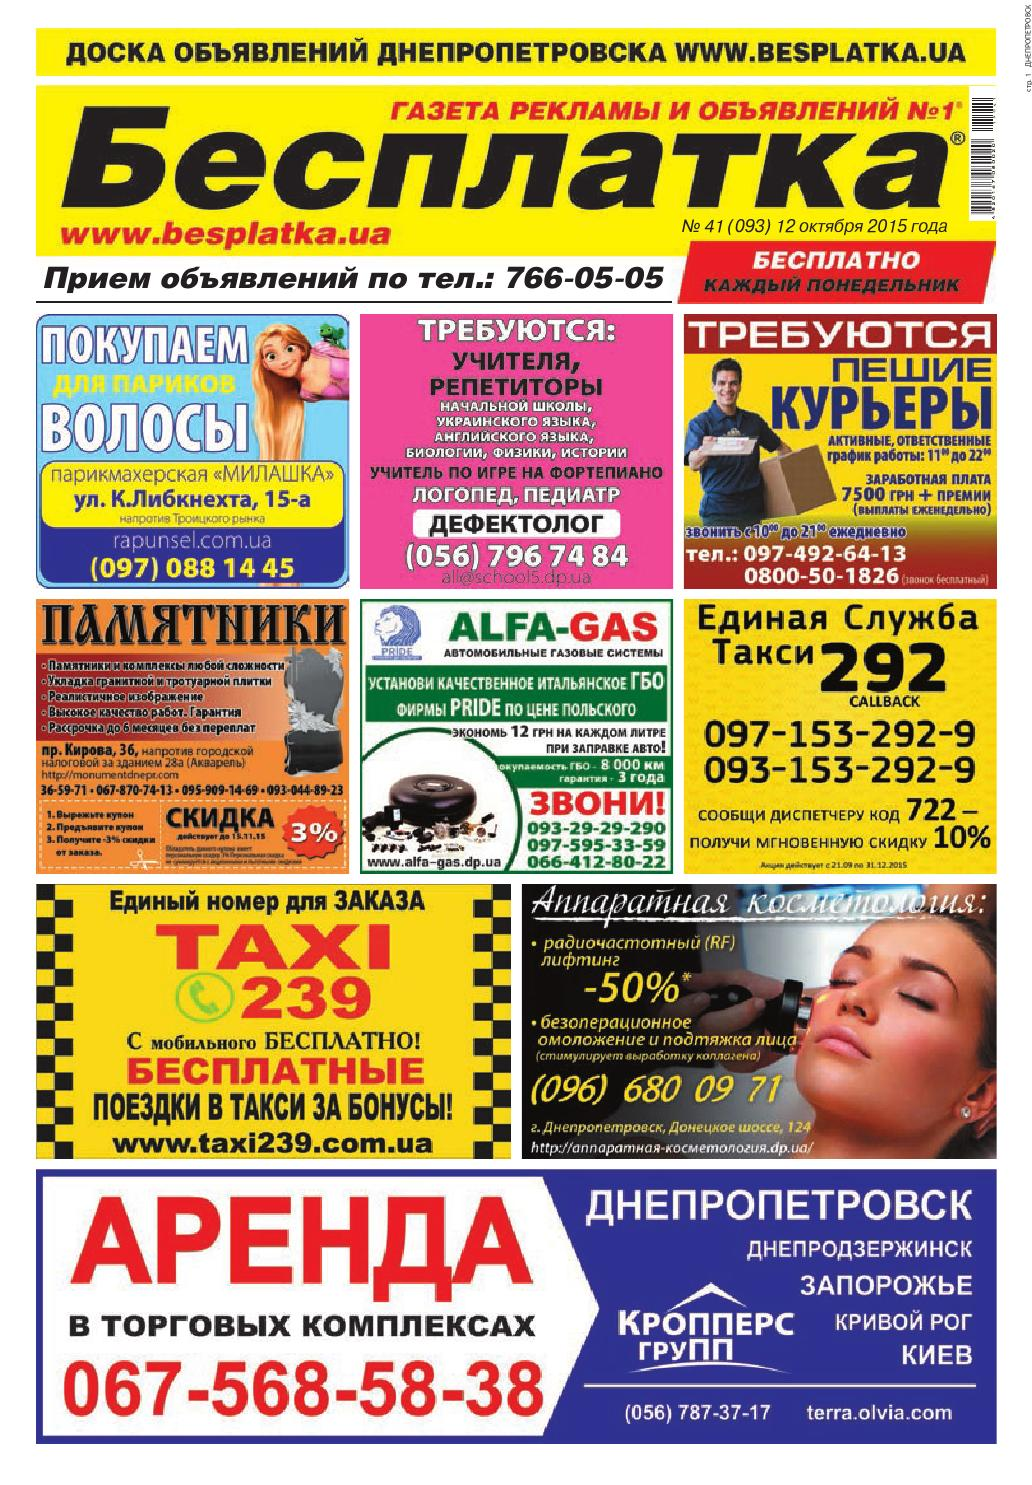 Besplatka  41 Днепропетровск by besplatka ukraine - issuu d13ae5afc68